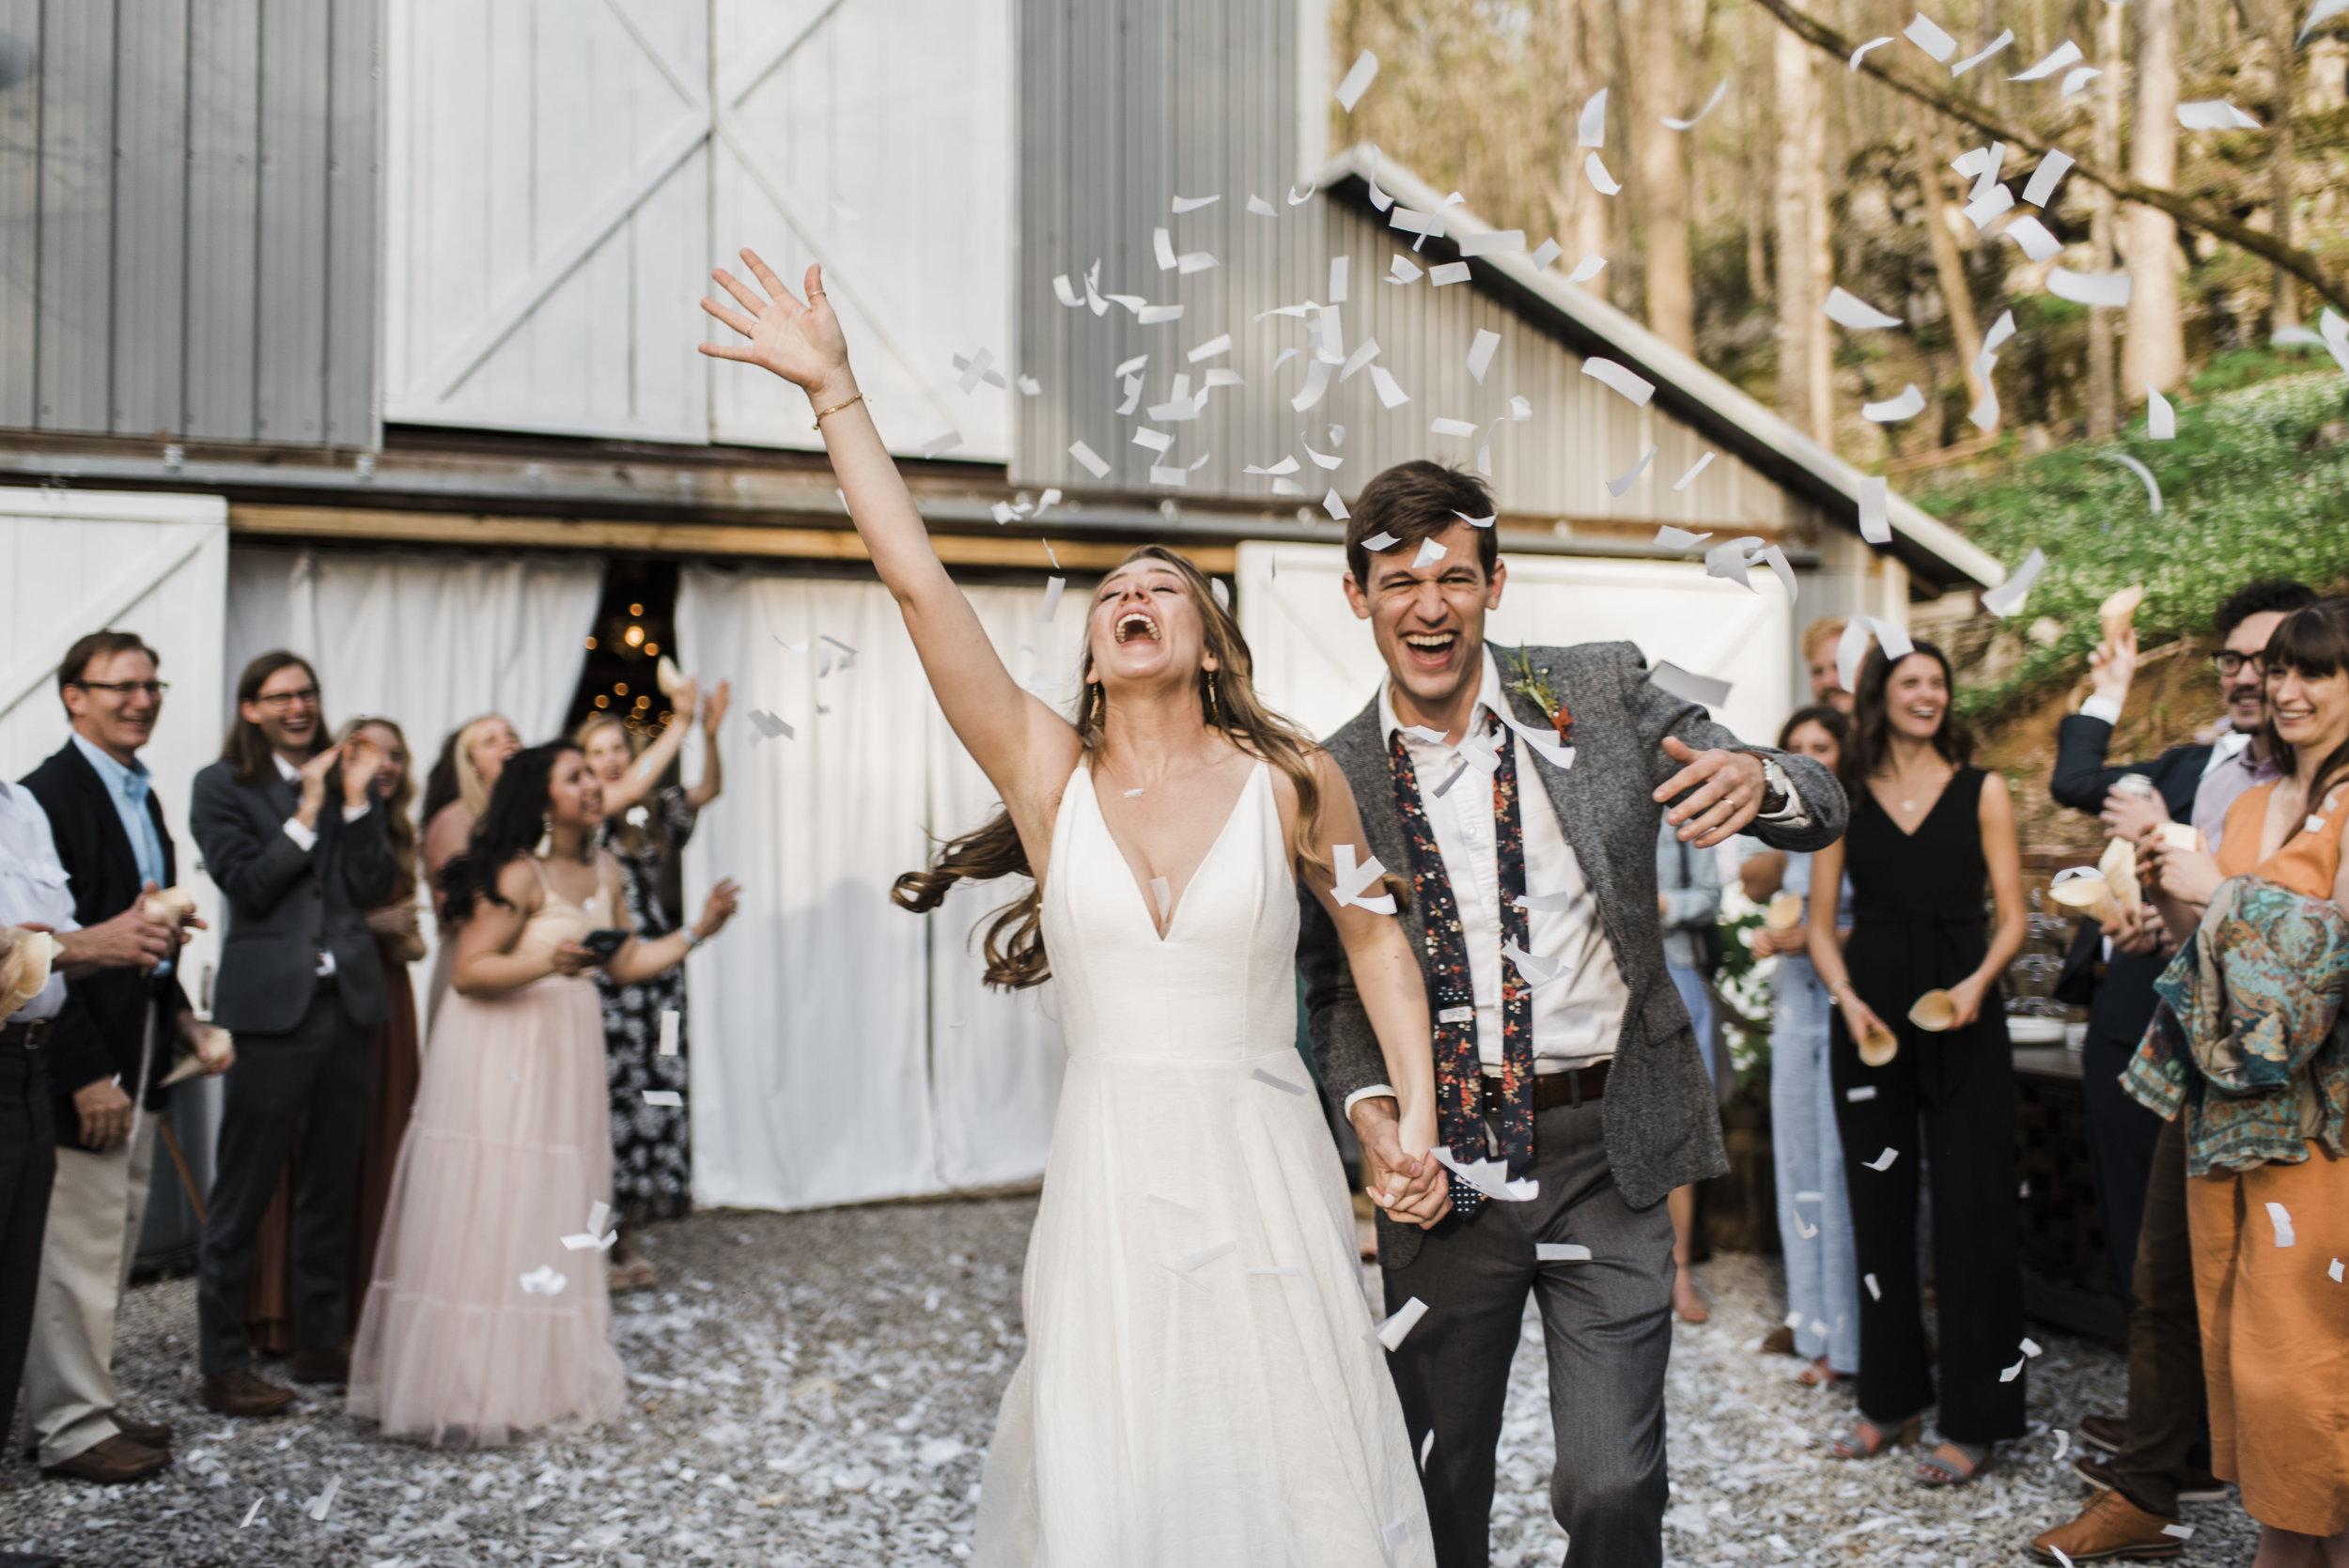 wedding reception exit confetti Chattanooga Tennessee